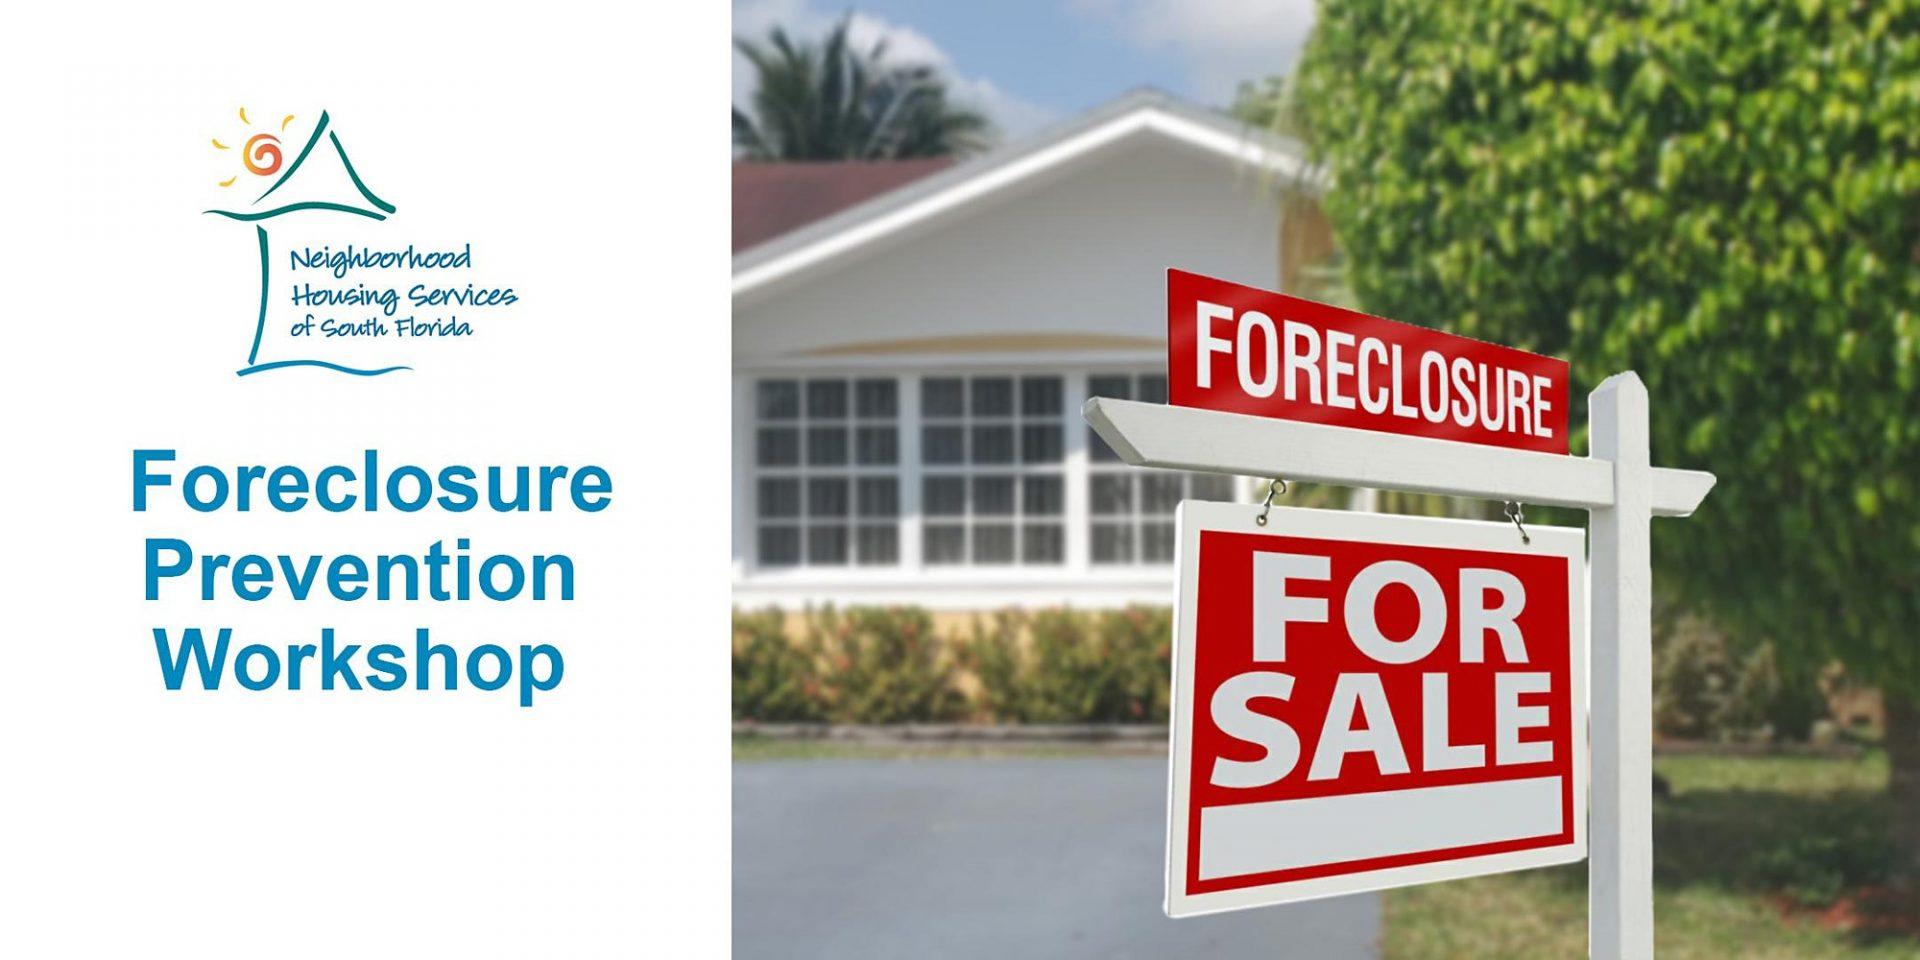 Foreclosure Prevention Workshop